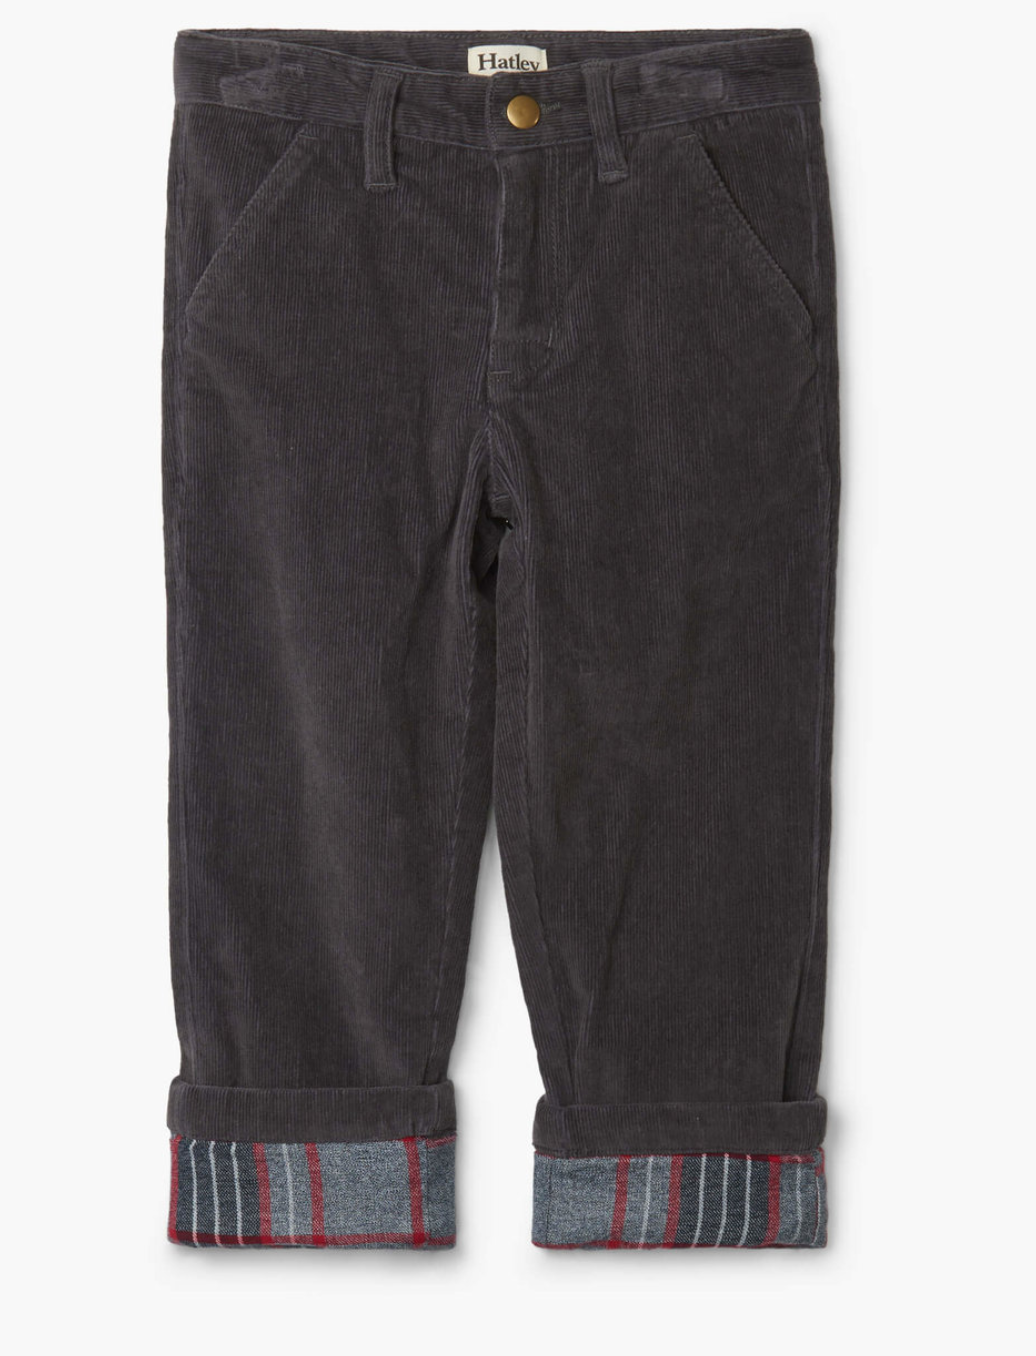 grey stretch cord pants